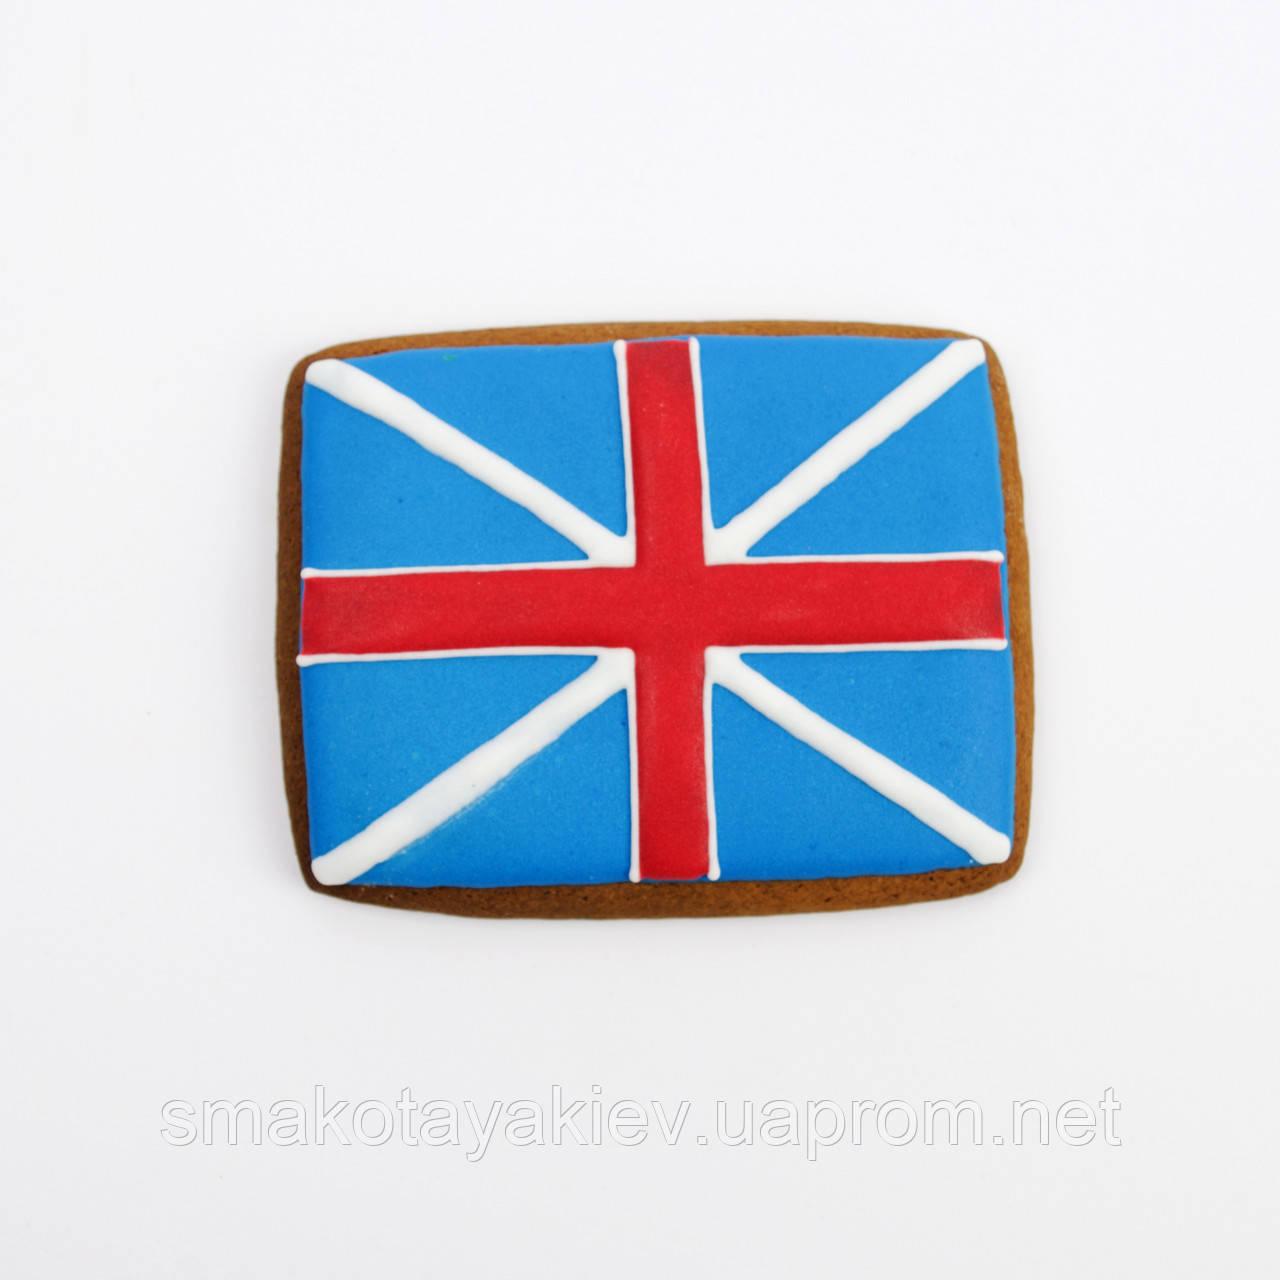 Пряник «Английский»